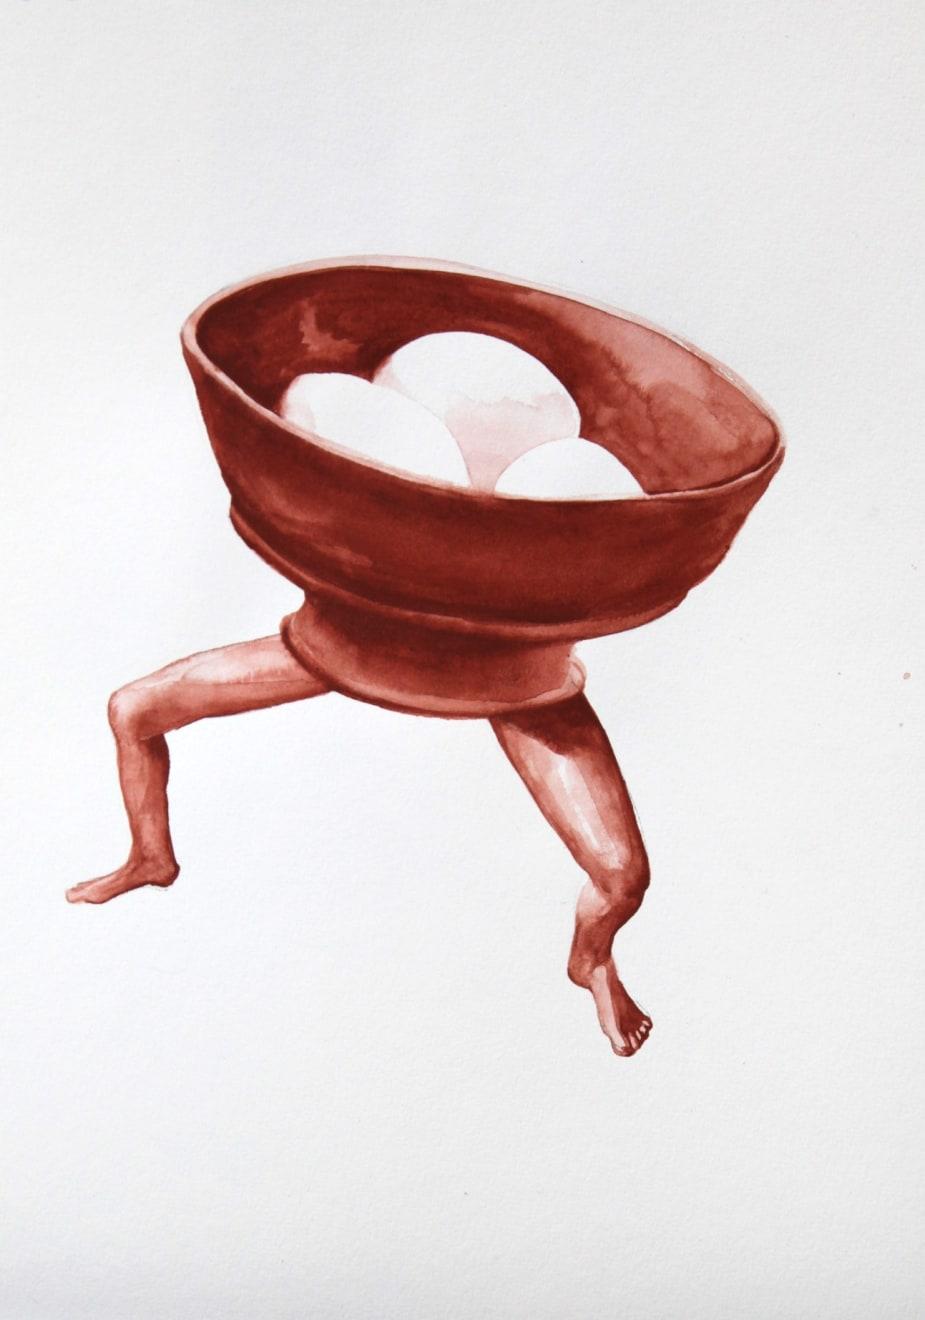 Kirsty Whiten, Stone Eggs in Chalice, 2019, Watercolour, 35 x 25 cm